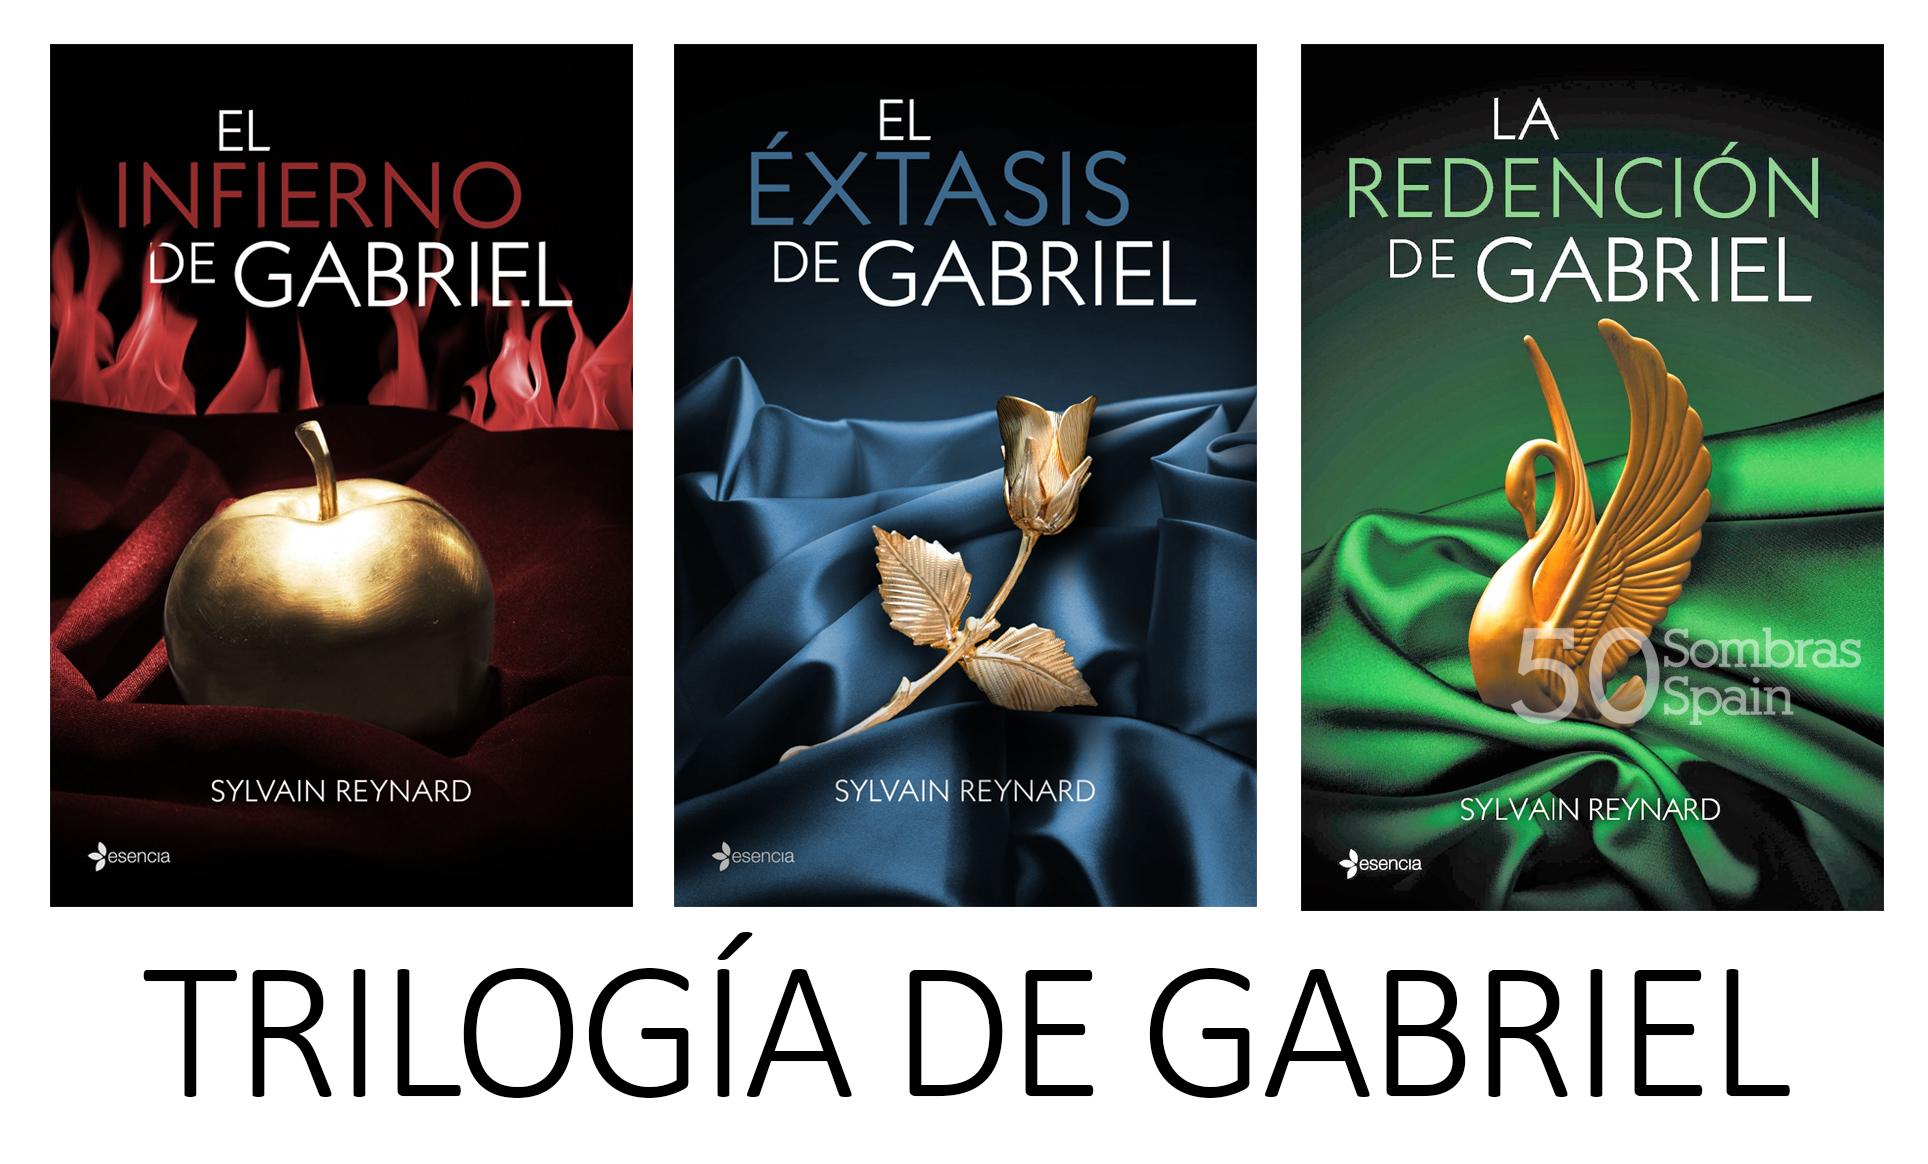 Trilogia Gabriel 50 Sombras